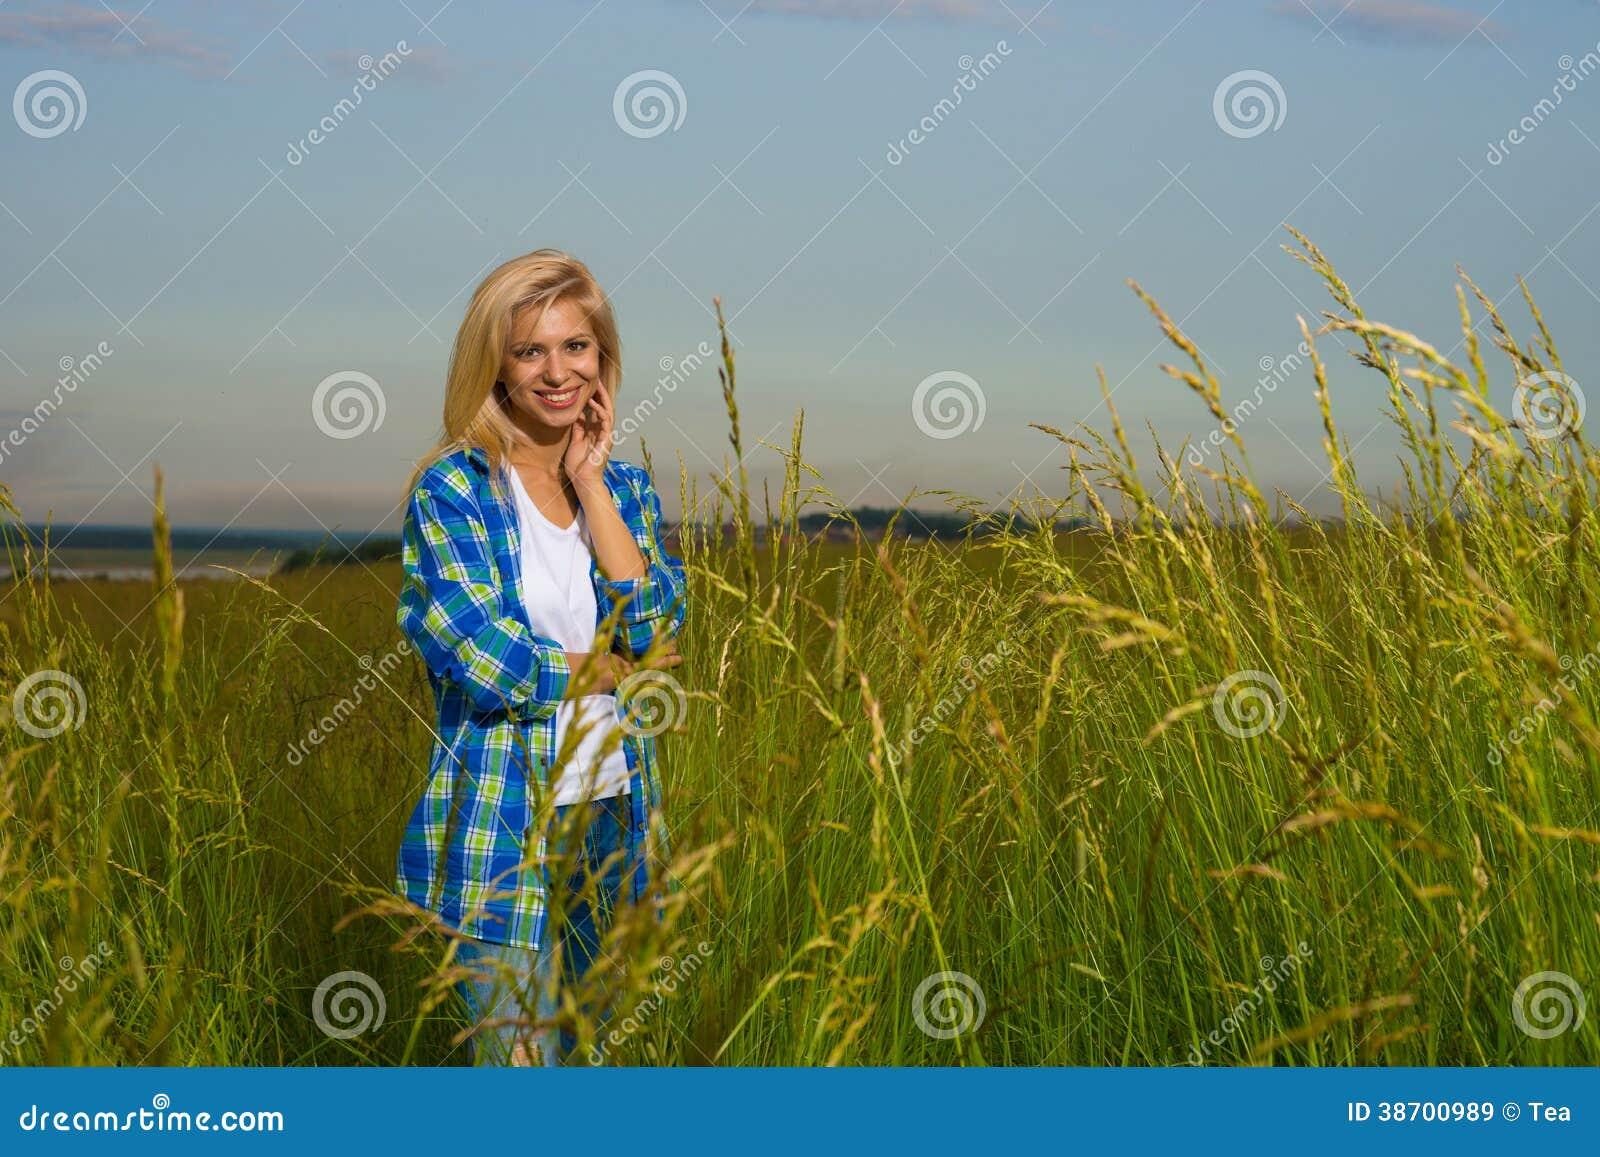 woman walking in grass - photo #21